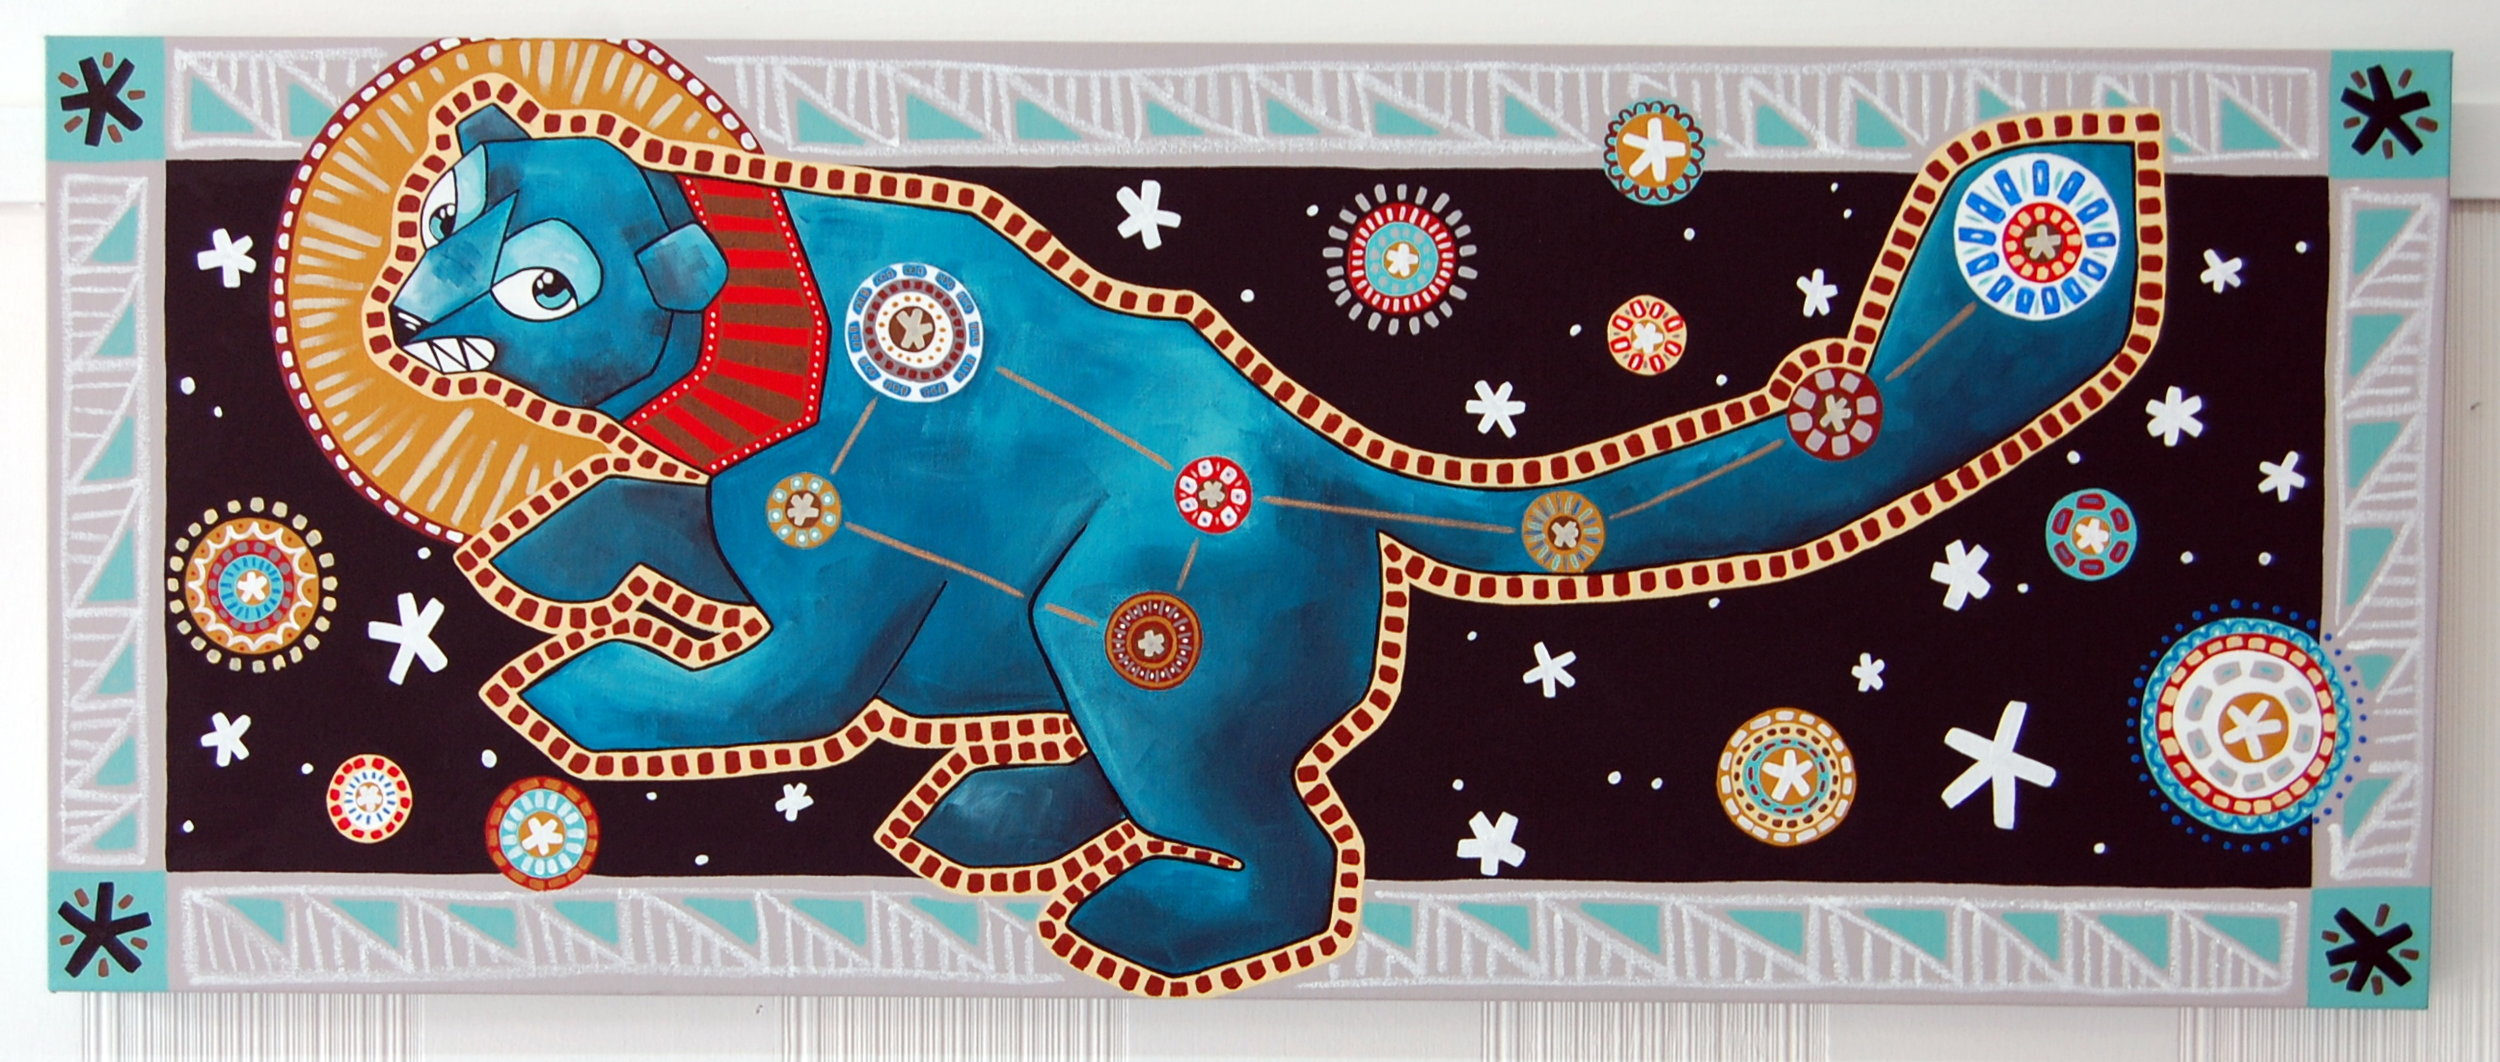 """Ursa Minor - The Little Dipper"" Acrylic on Canvas 18"" x 36"" // SOLD"